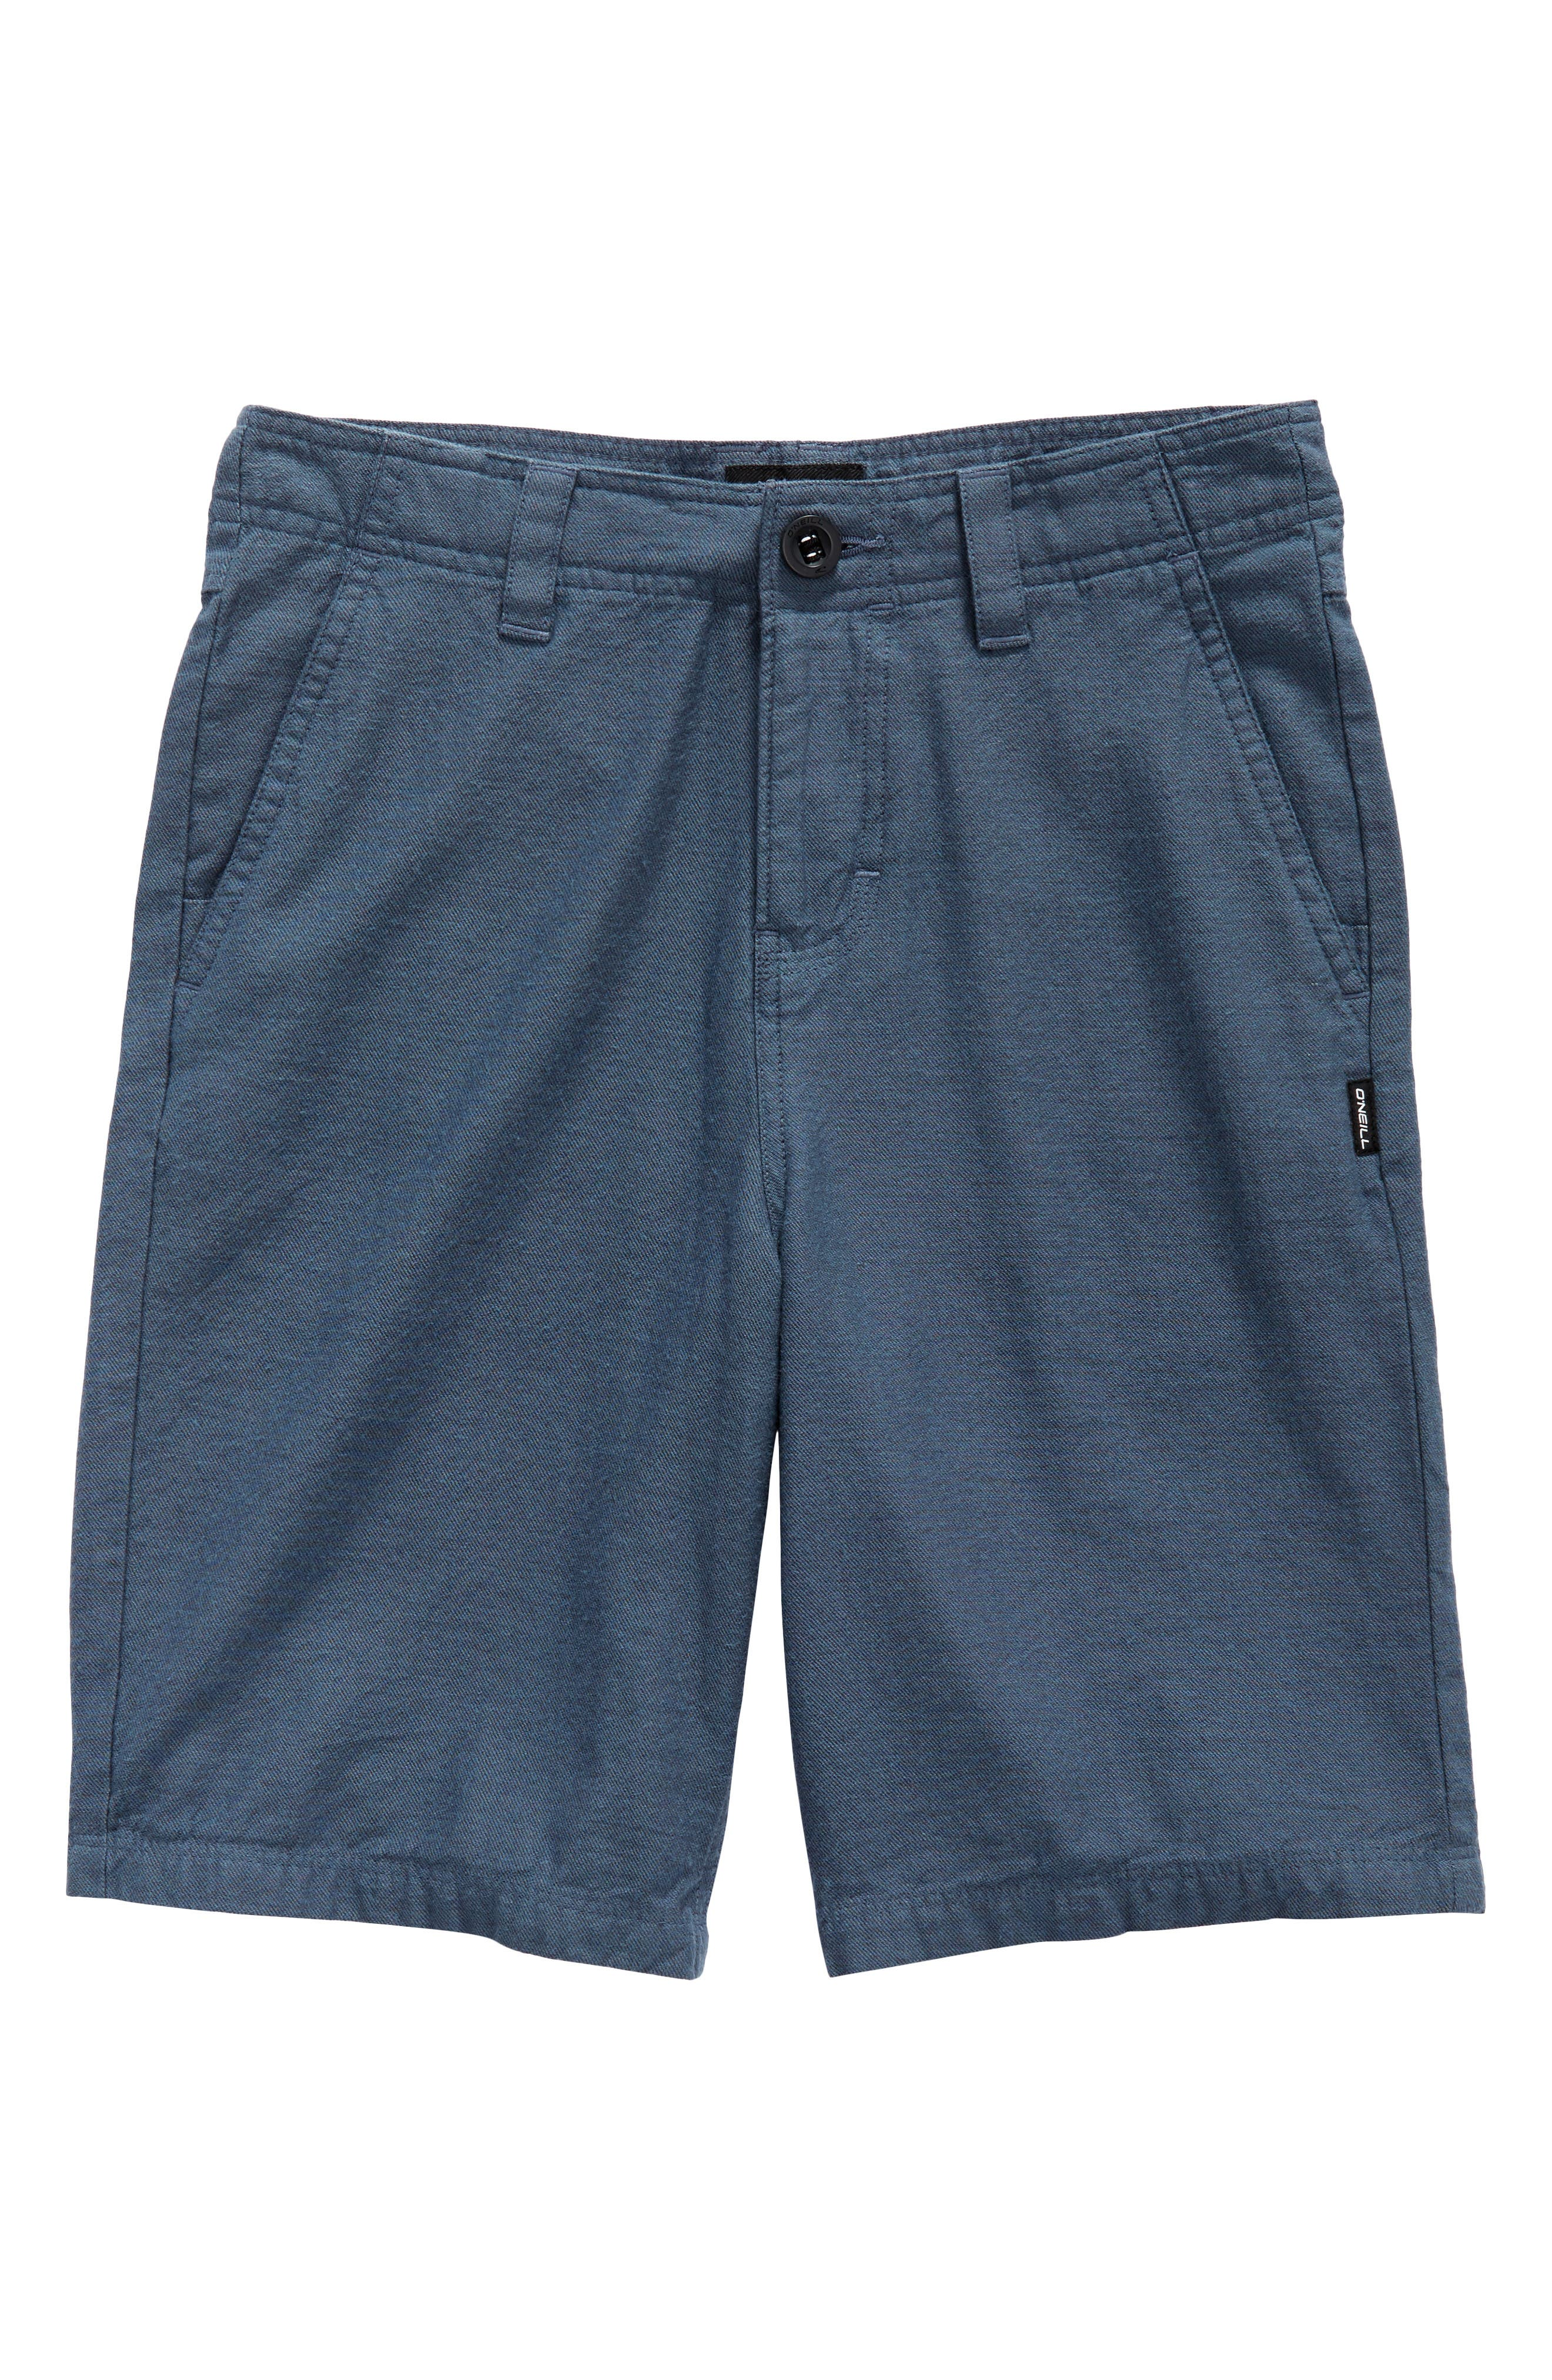 Main Image - O'Neill Scranton Chino Shorts (Big Boys)